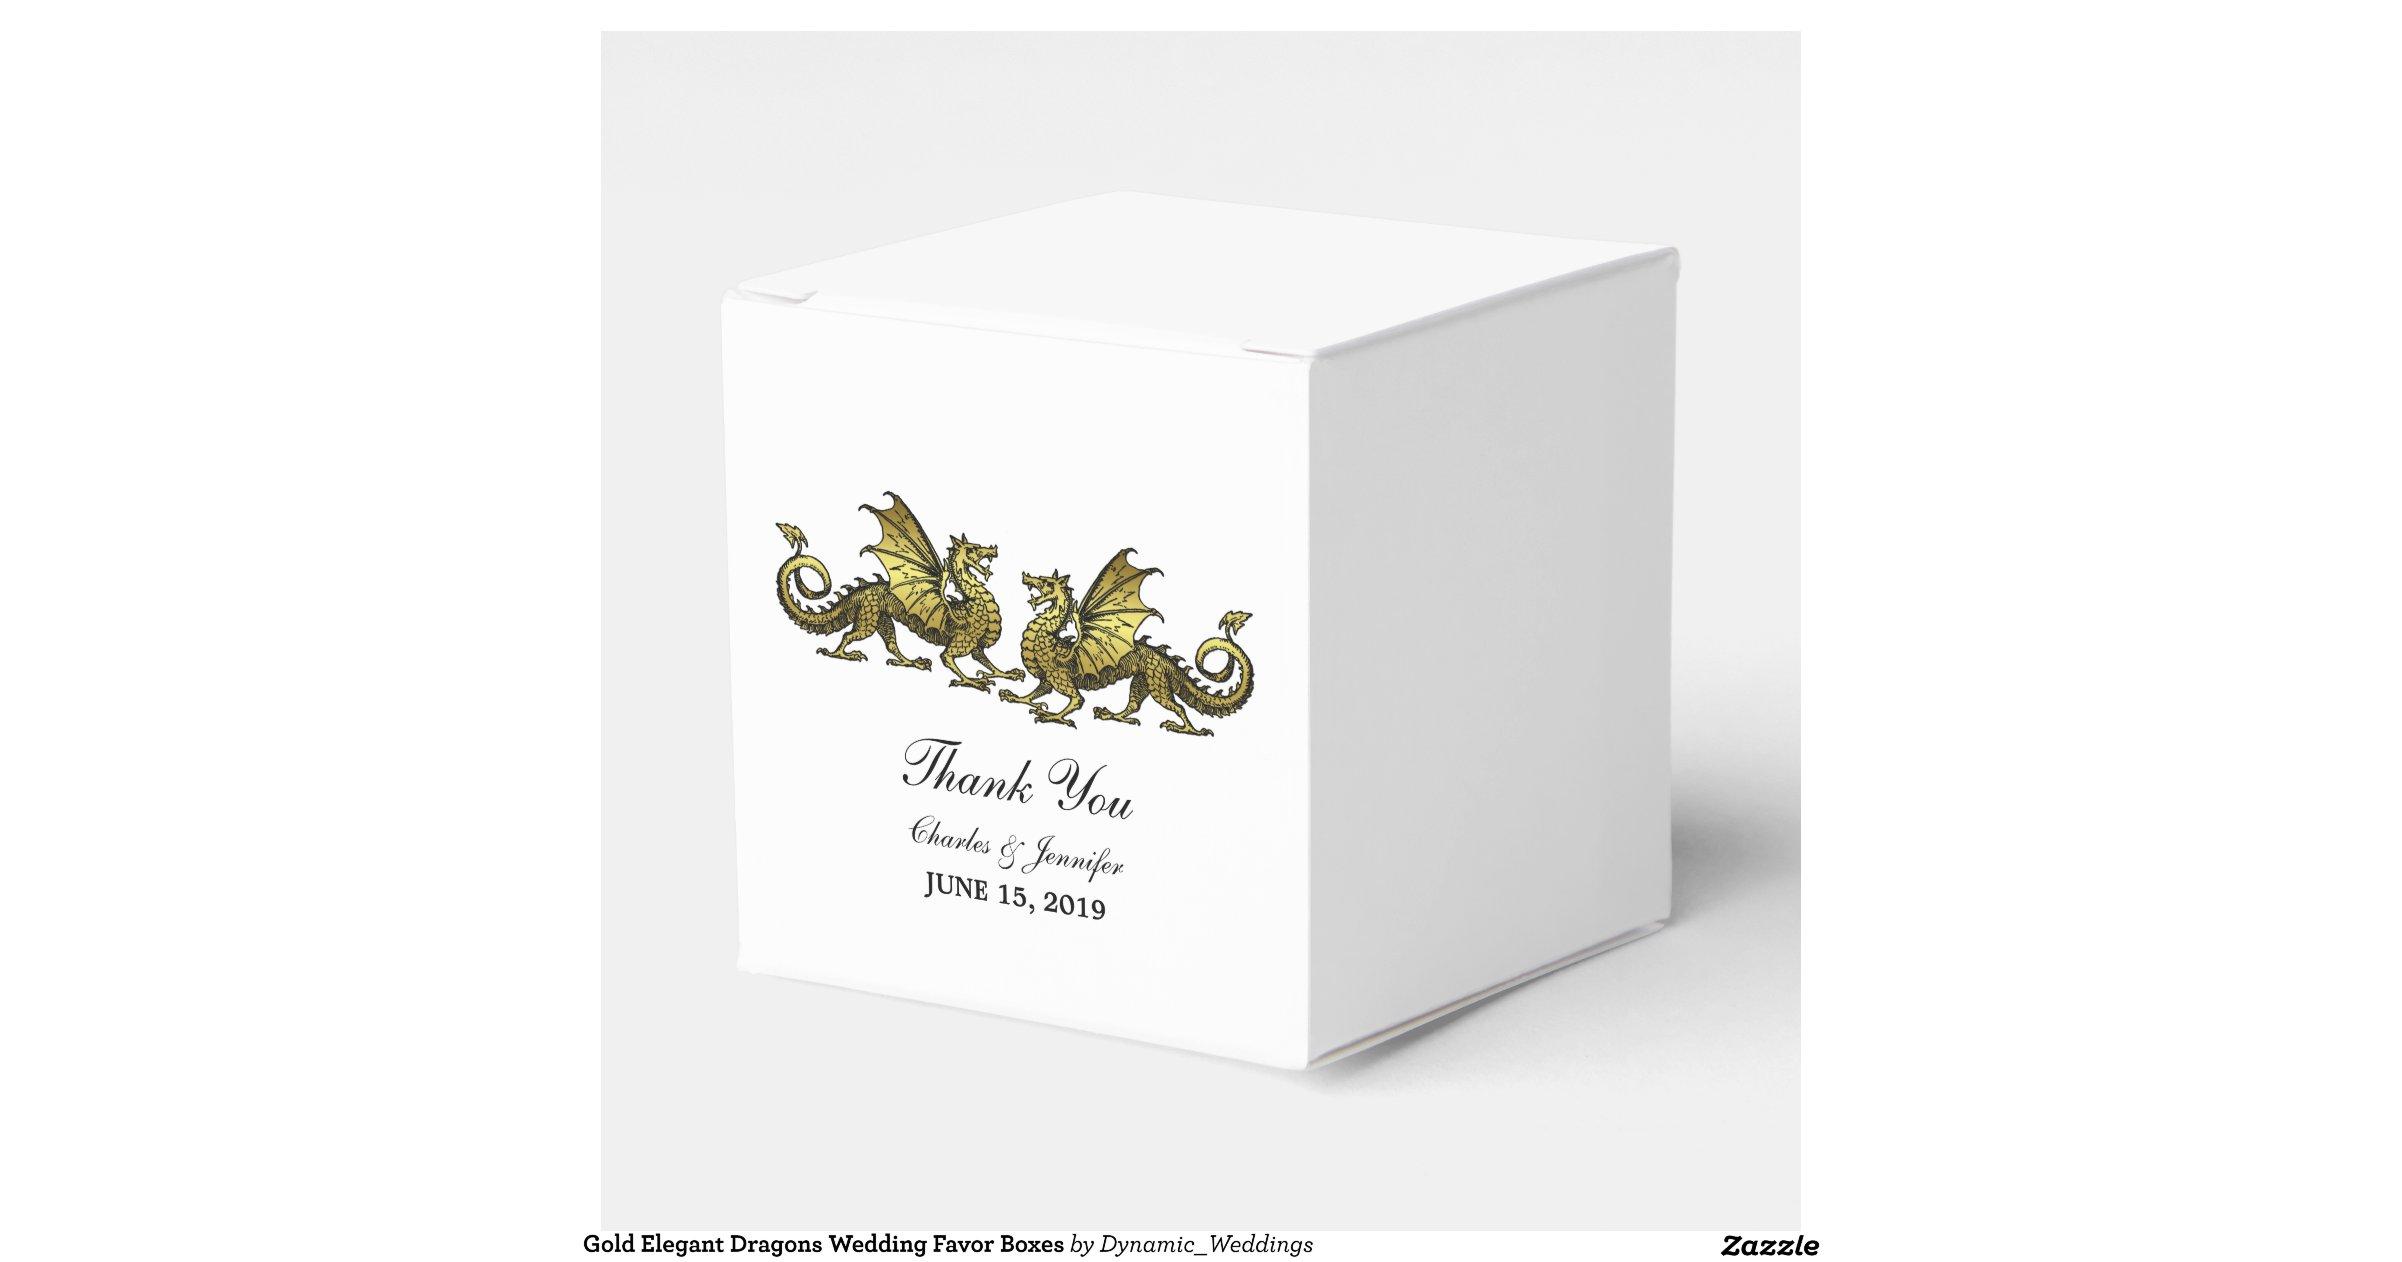 Wedding Favor Boxes Trinidad : Gold elegant dragons wedding favor boxes zazzle